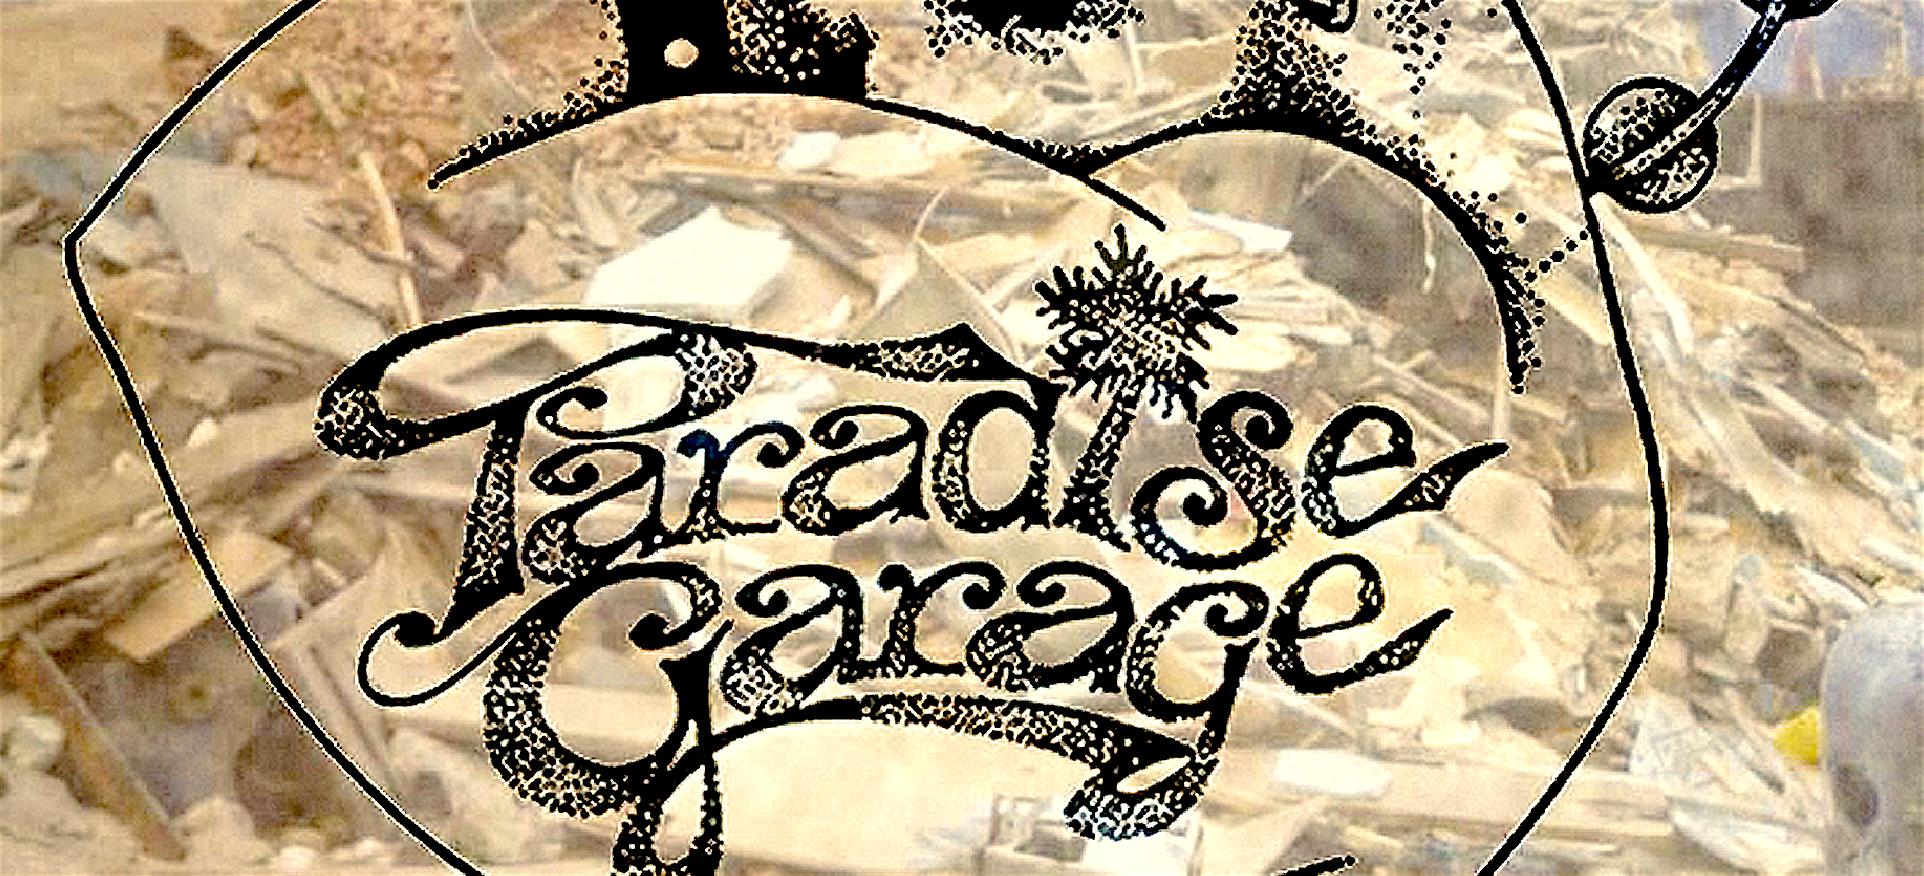 Profile jacques greene classic paradise garage the beginning the end of an era izmirmasajfo